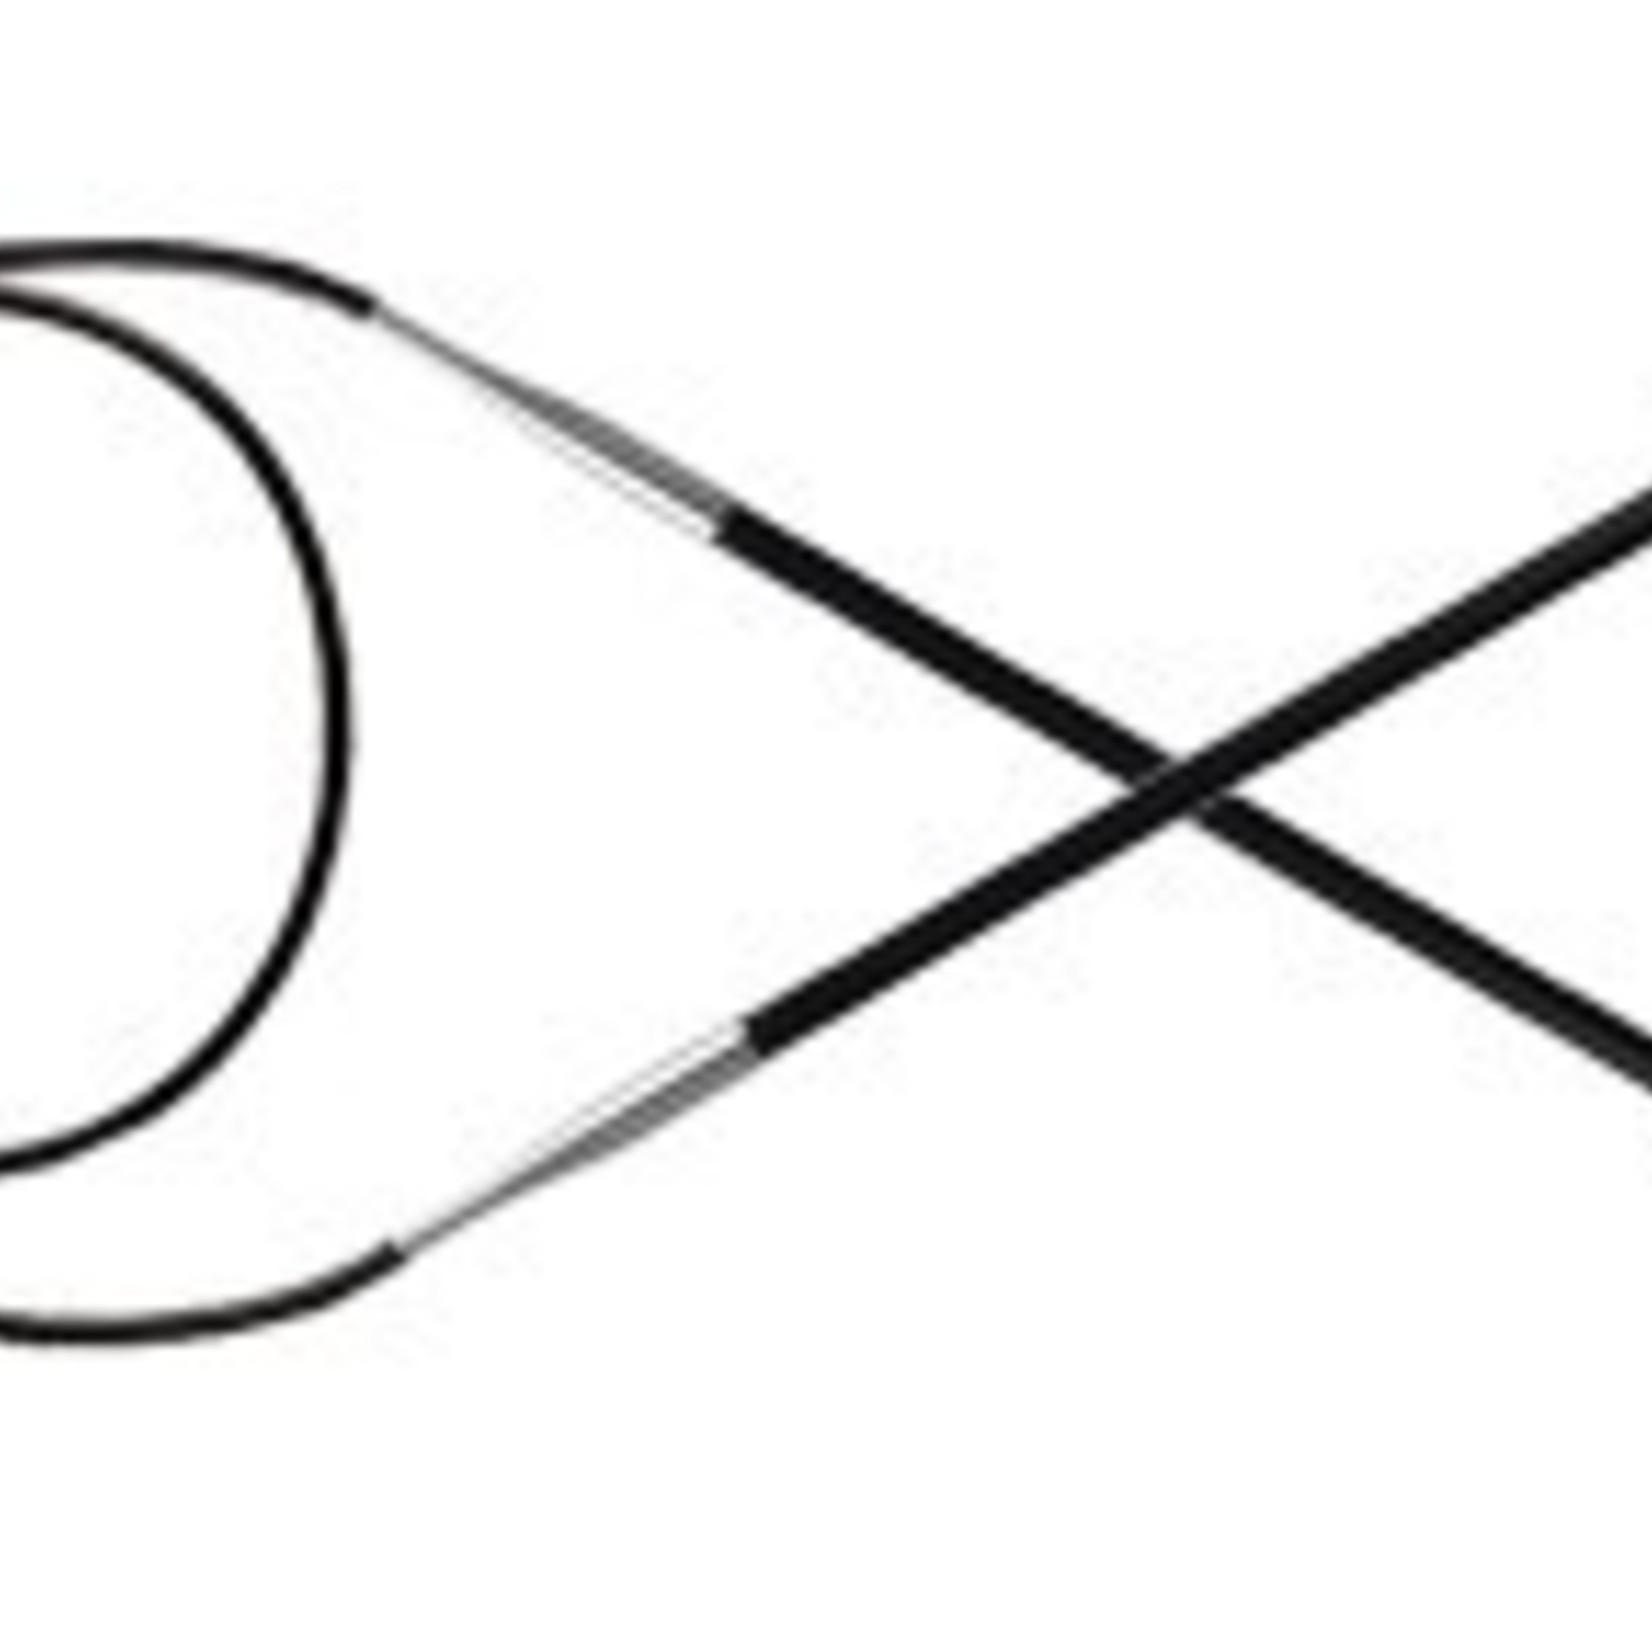 Knitter's Pride 3 Karbonz Circular 32